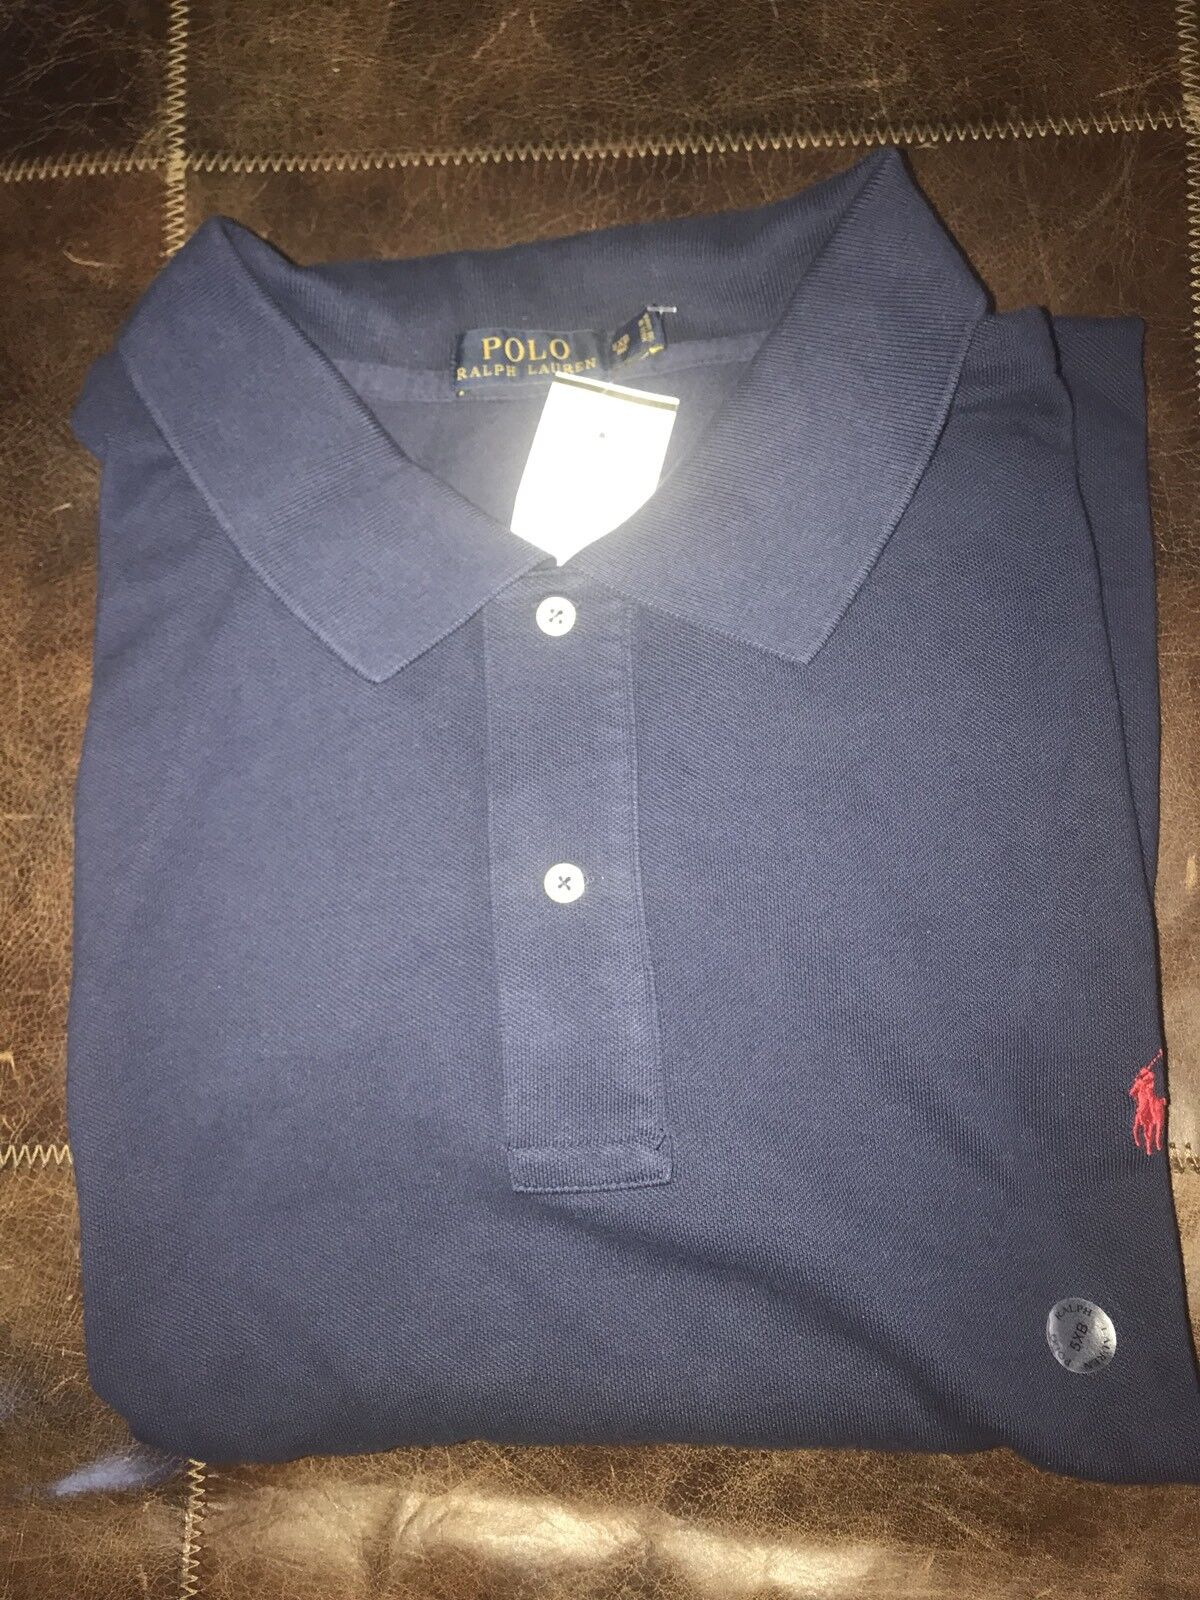 New Polo Ralph Lauren Men Small Pony Shirt 5XB 5XBIG Mesh Cotton Long Sleeve